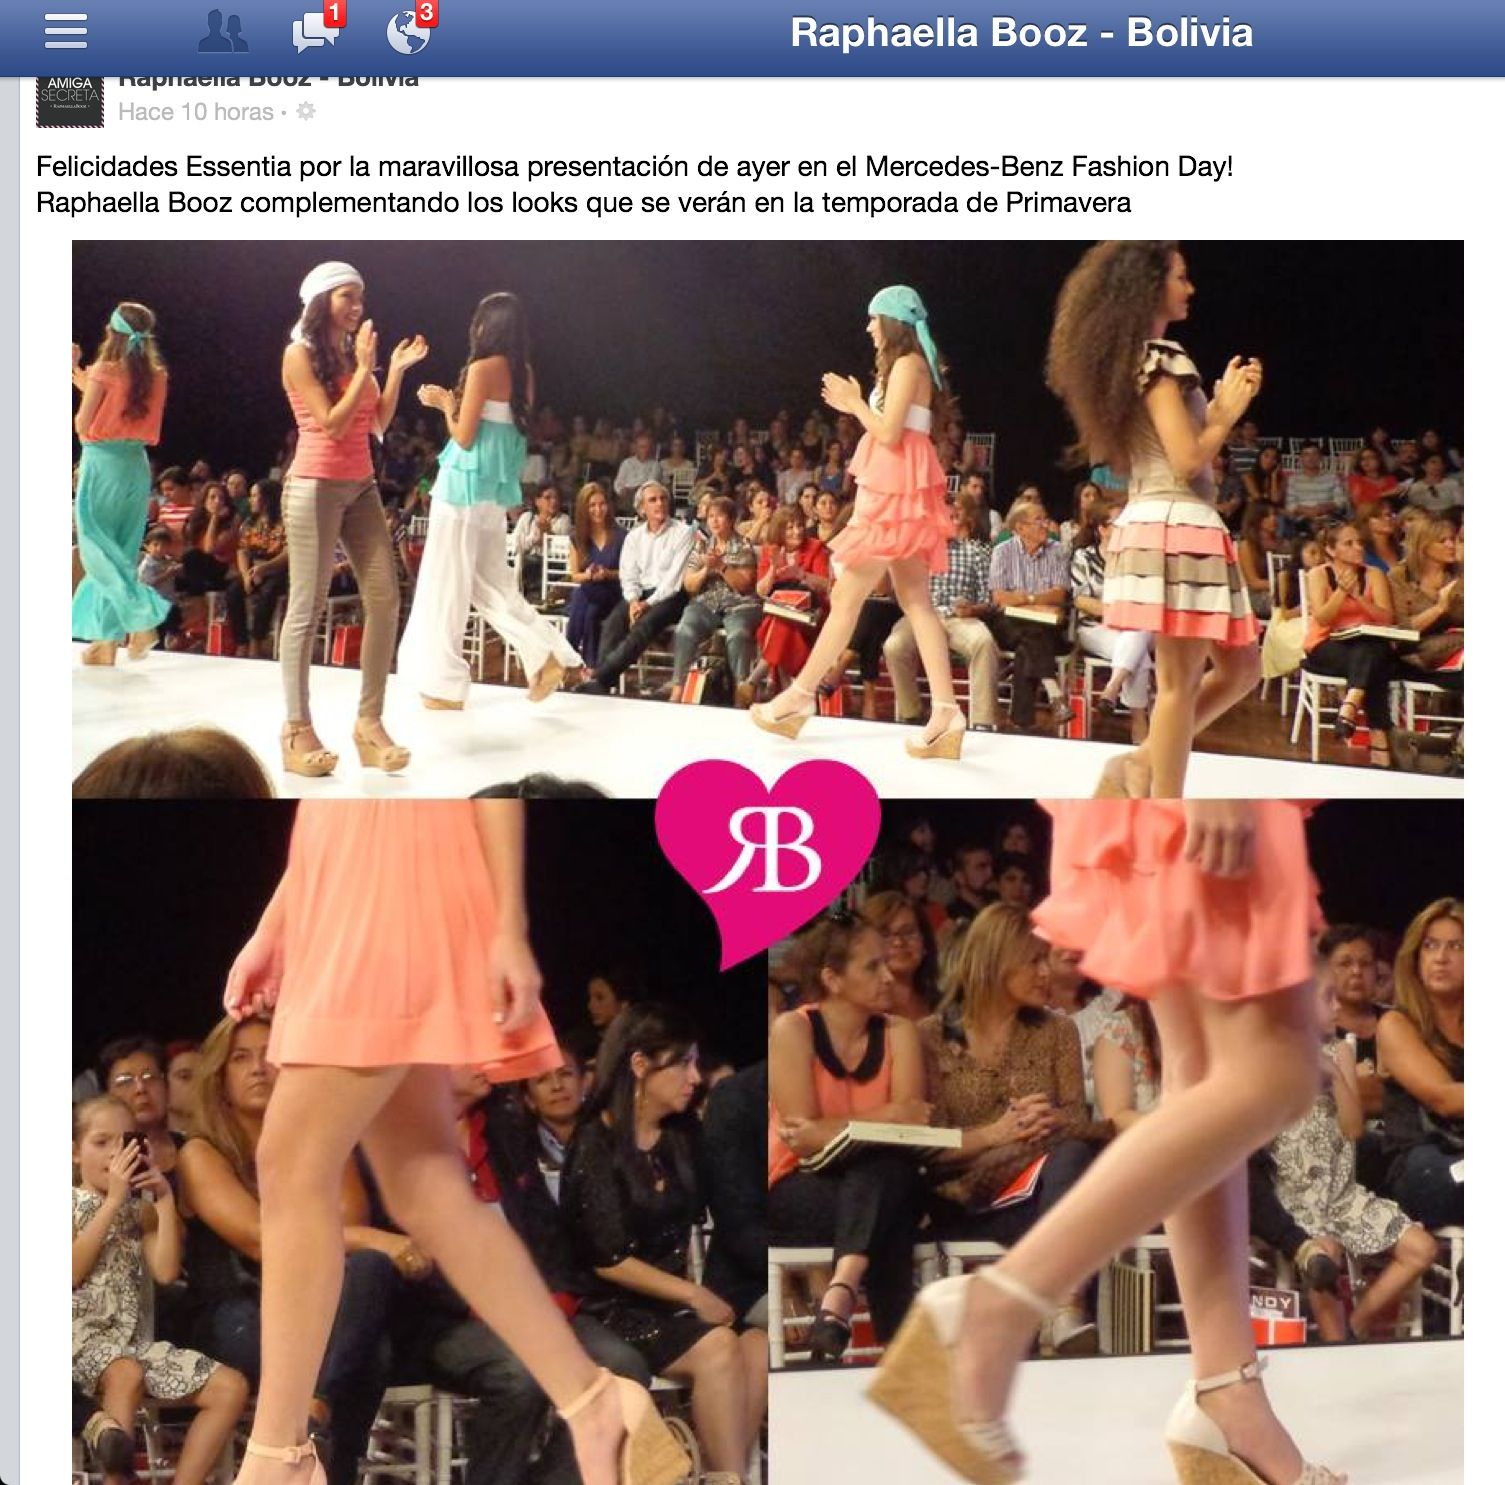 Essentia look perfecto gracias Raphaella Booz